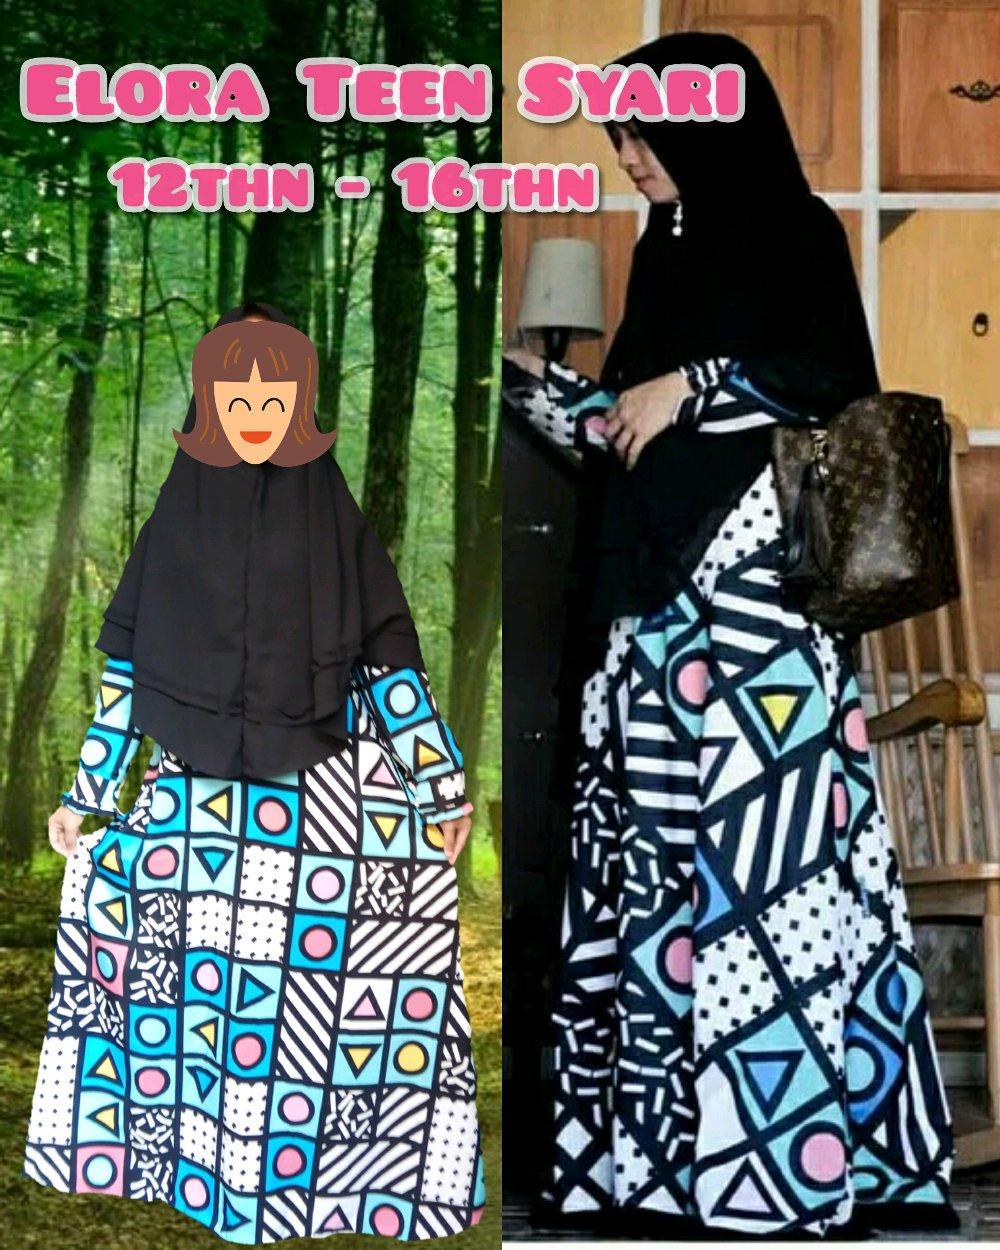 Teen Kids 10thn to 15thn Syari Gamis Maxi Dress Anak SMP SMA plus jilbab di lapak anayanda shop anayandashop